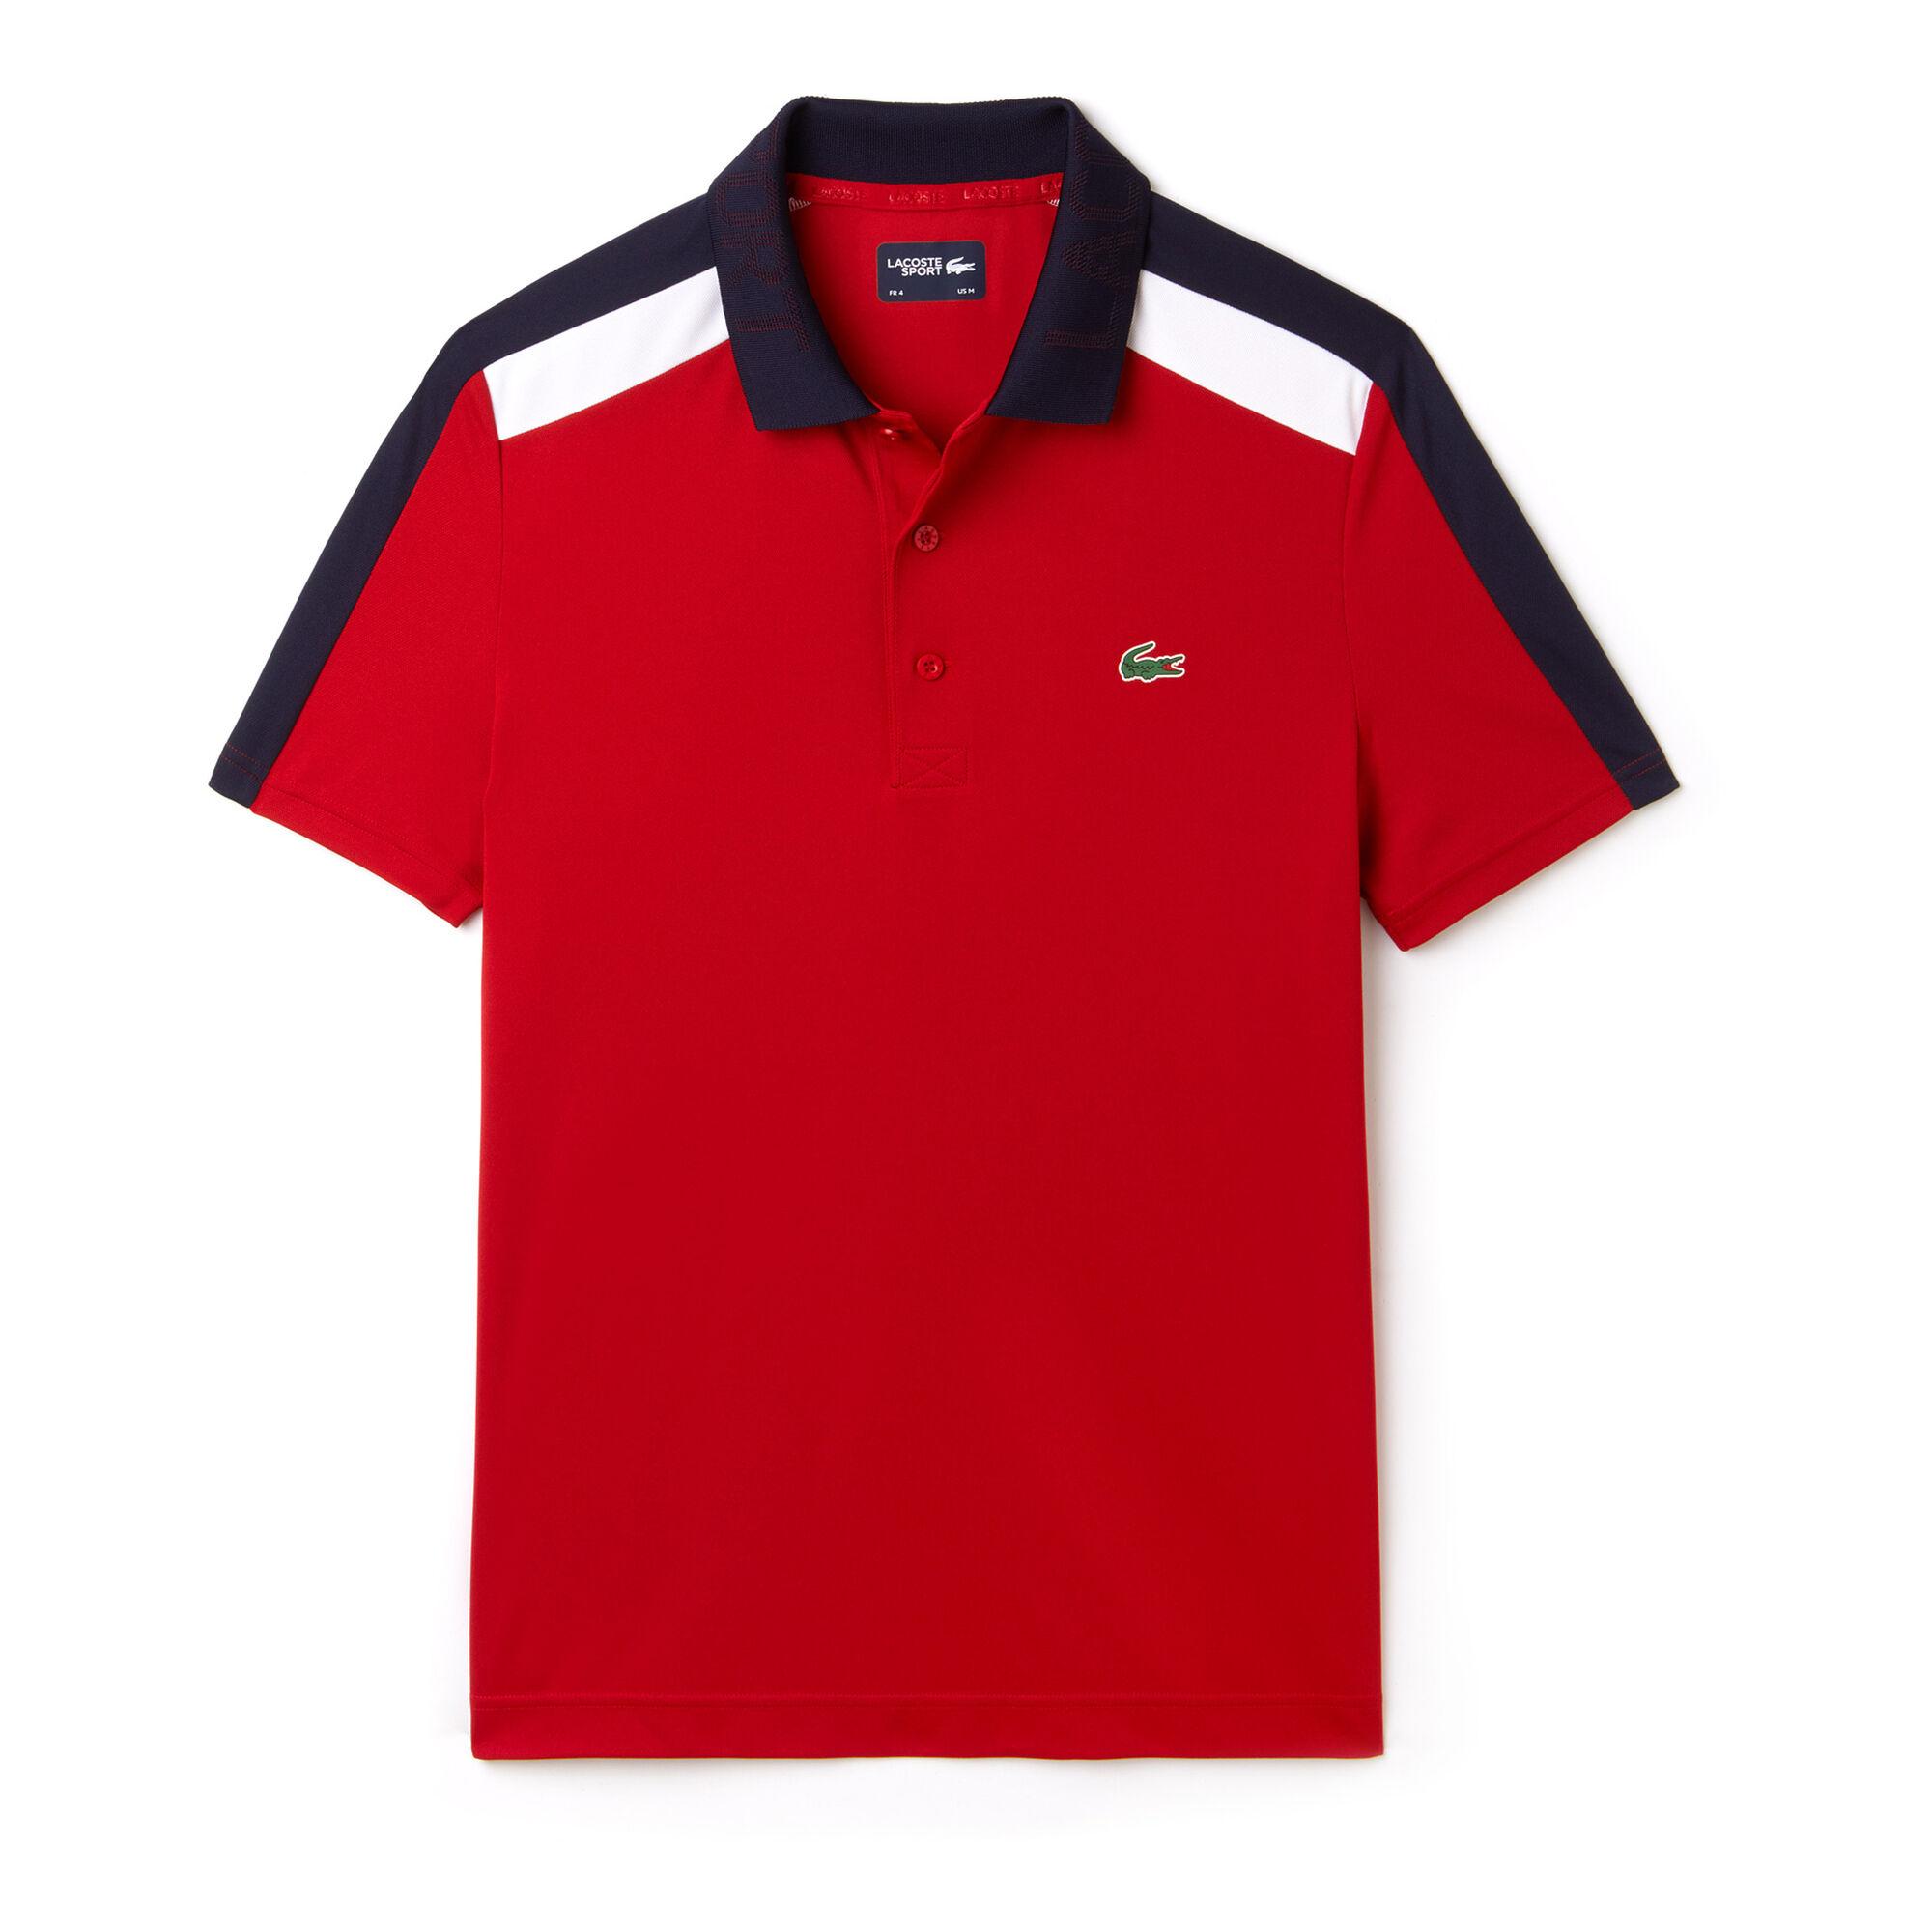 4bdab9e888 Lacoste Ribbed Collar Polo Hommes - Rouge , Noir online kopen ...